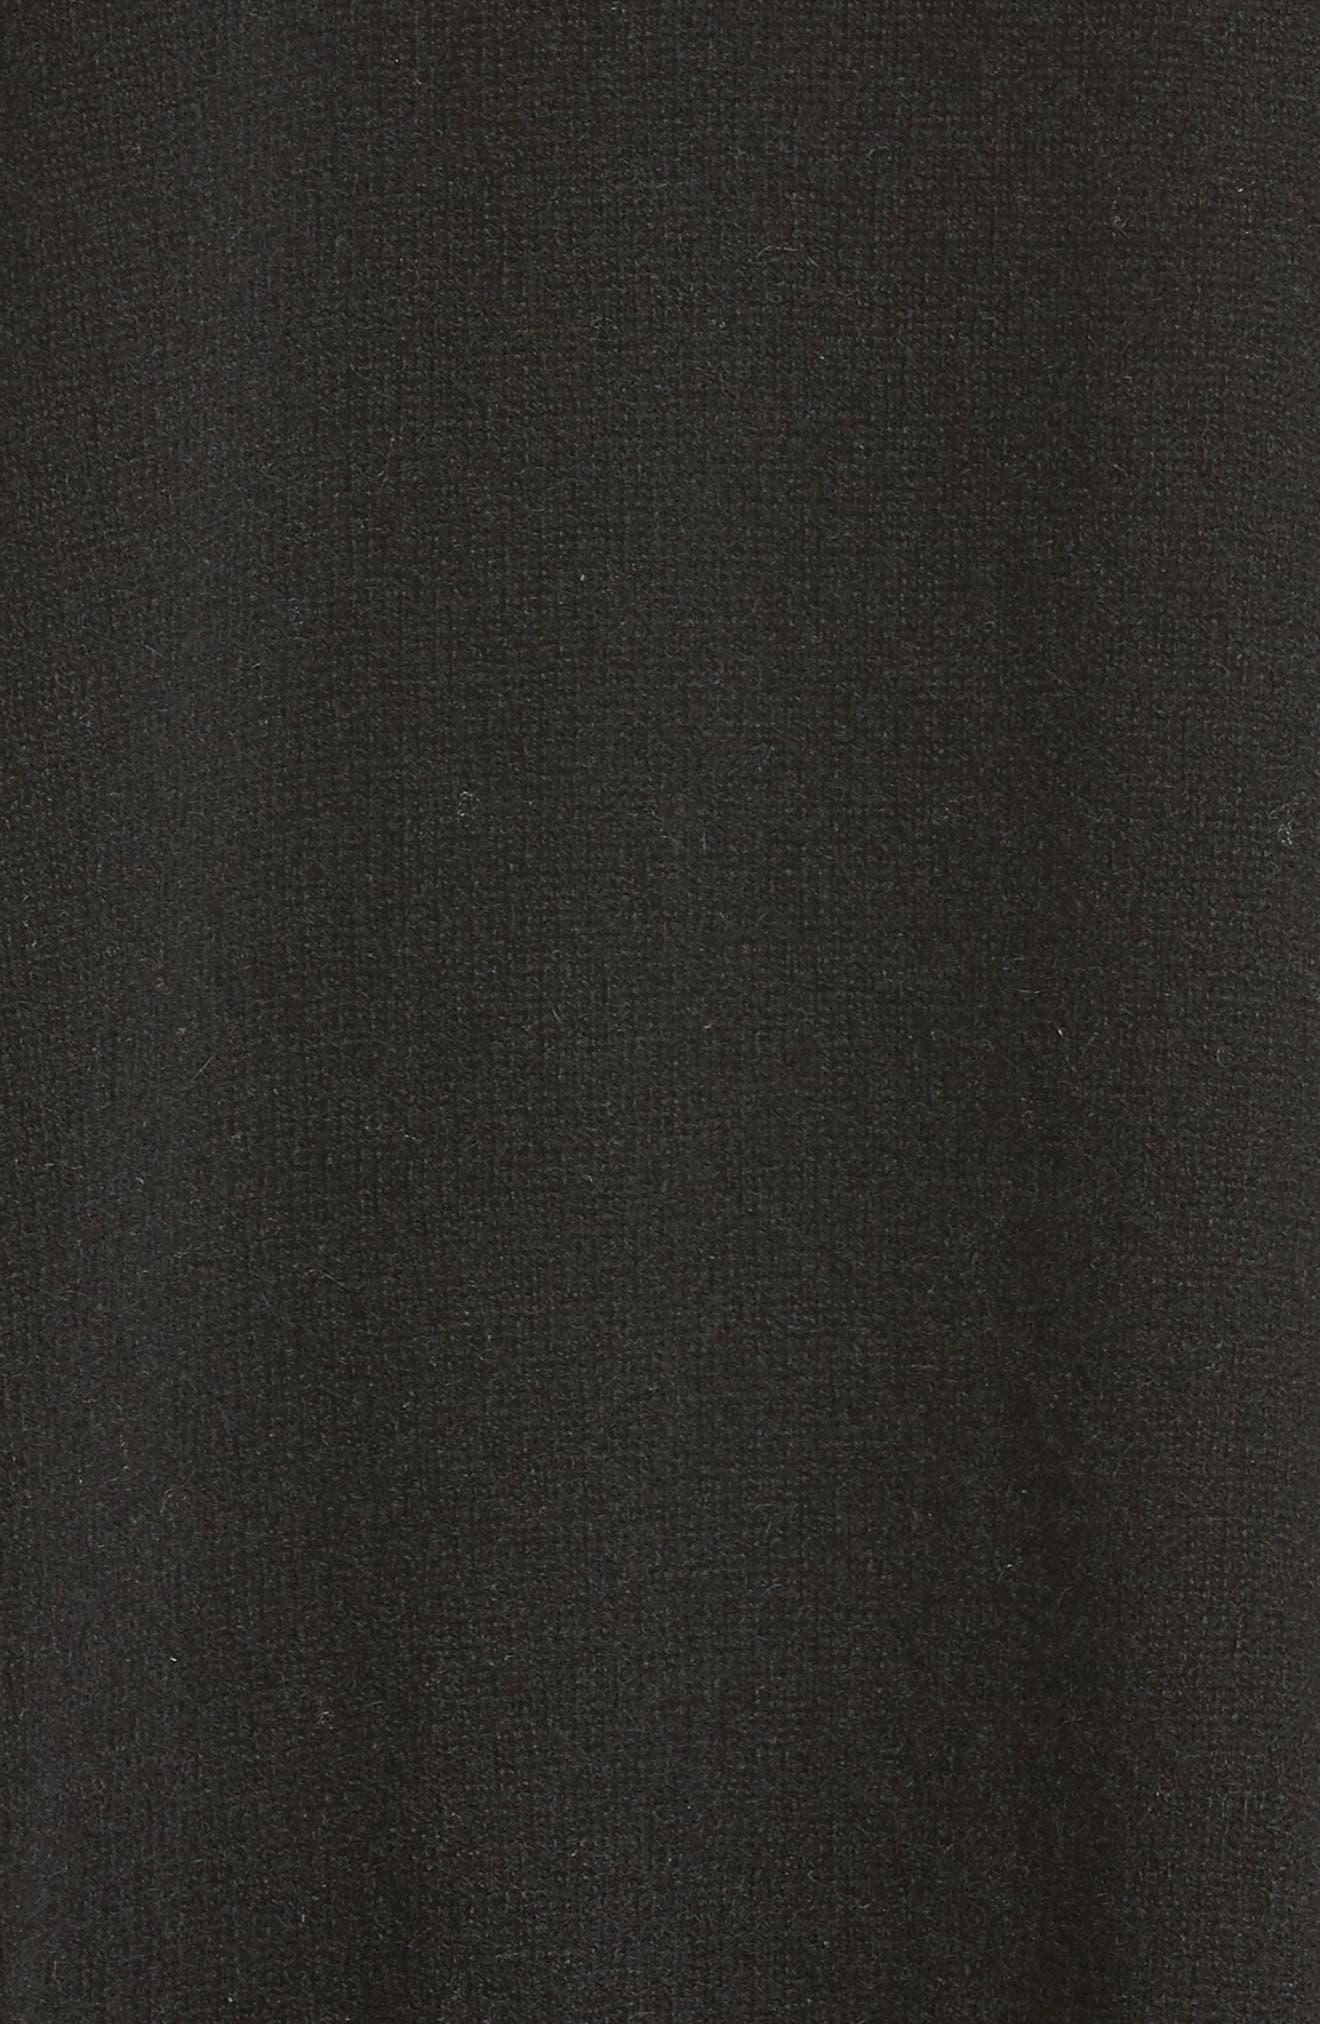 Crop Cashmere Sweater,                             Alternate thumbnail 5, color,                             001